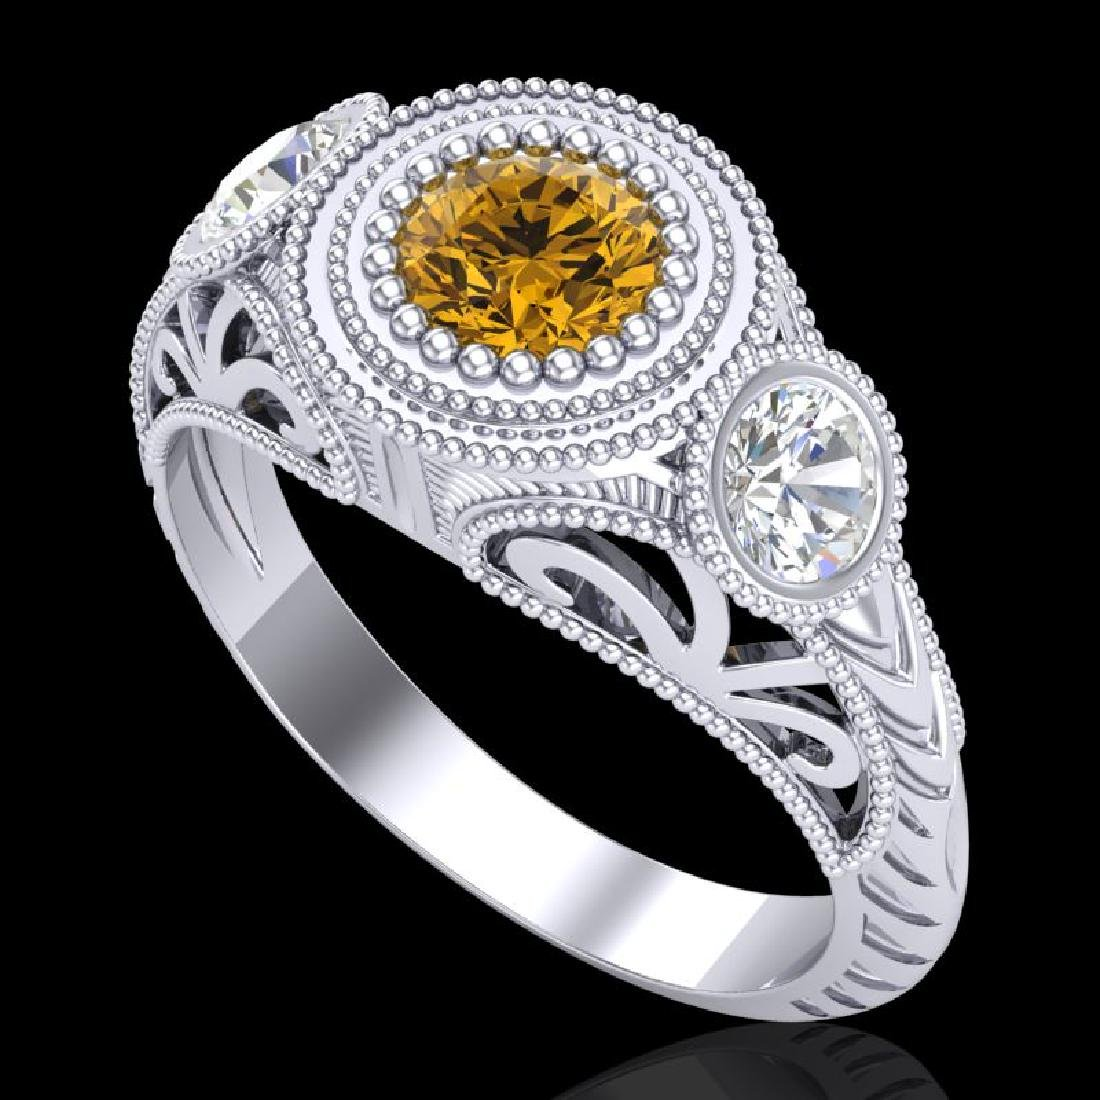 1.06 CTW Intense Fancy Yellow Diamond Art Deco 3 Stone